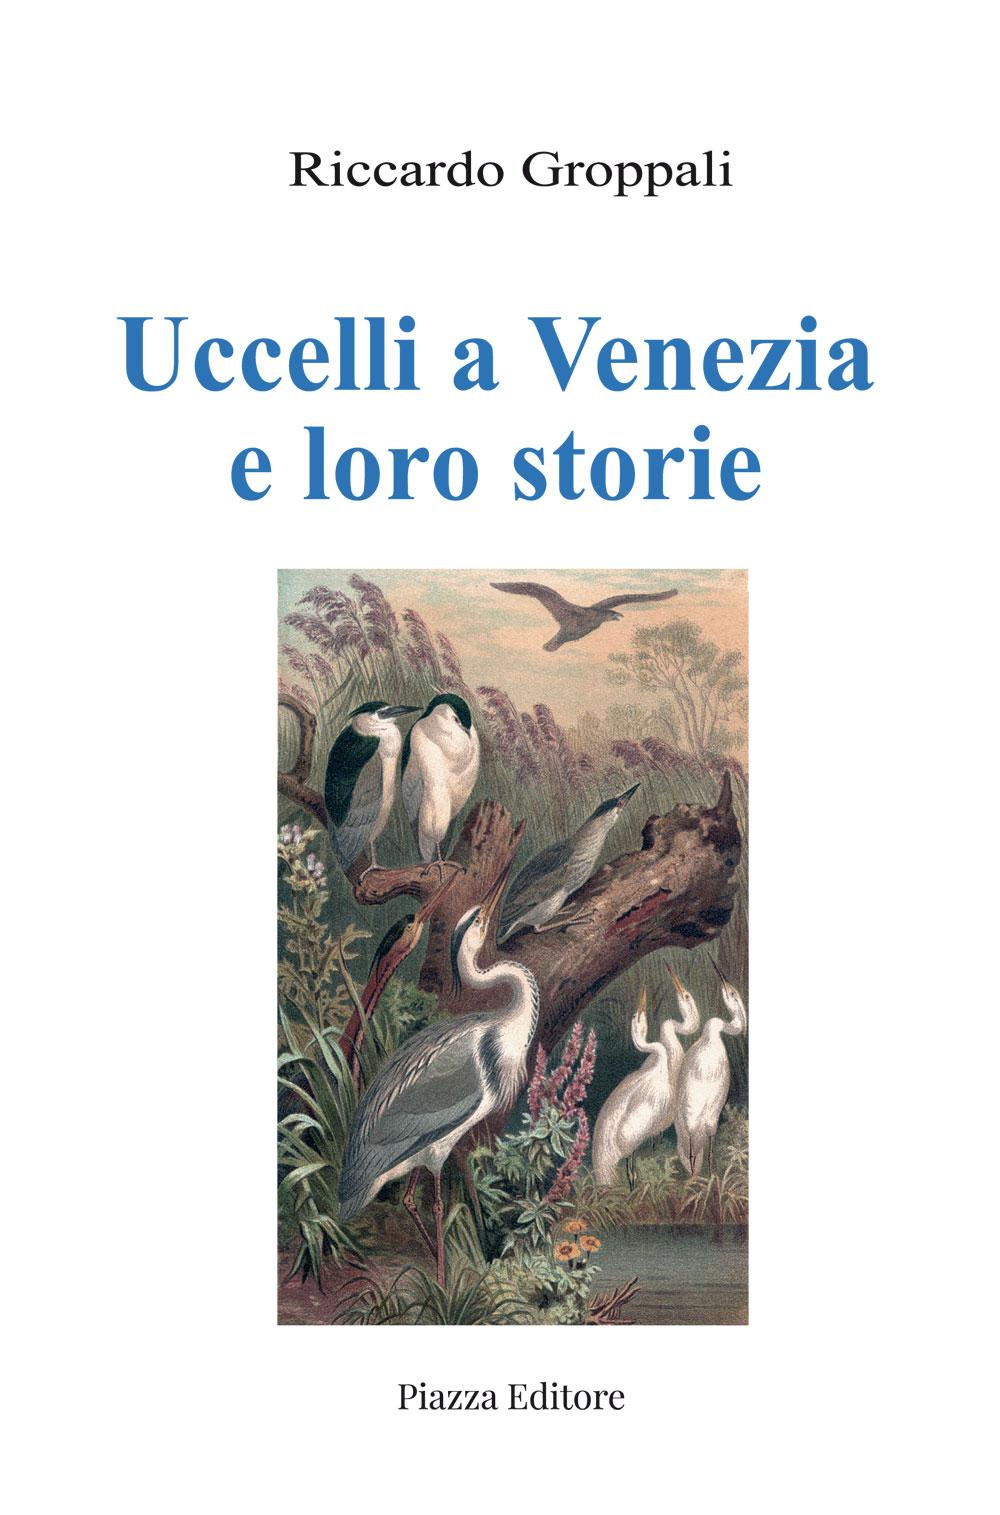 Uccelli a Venezia e loro storie